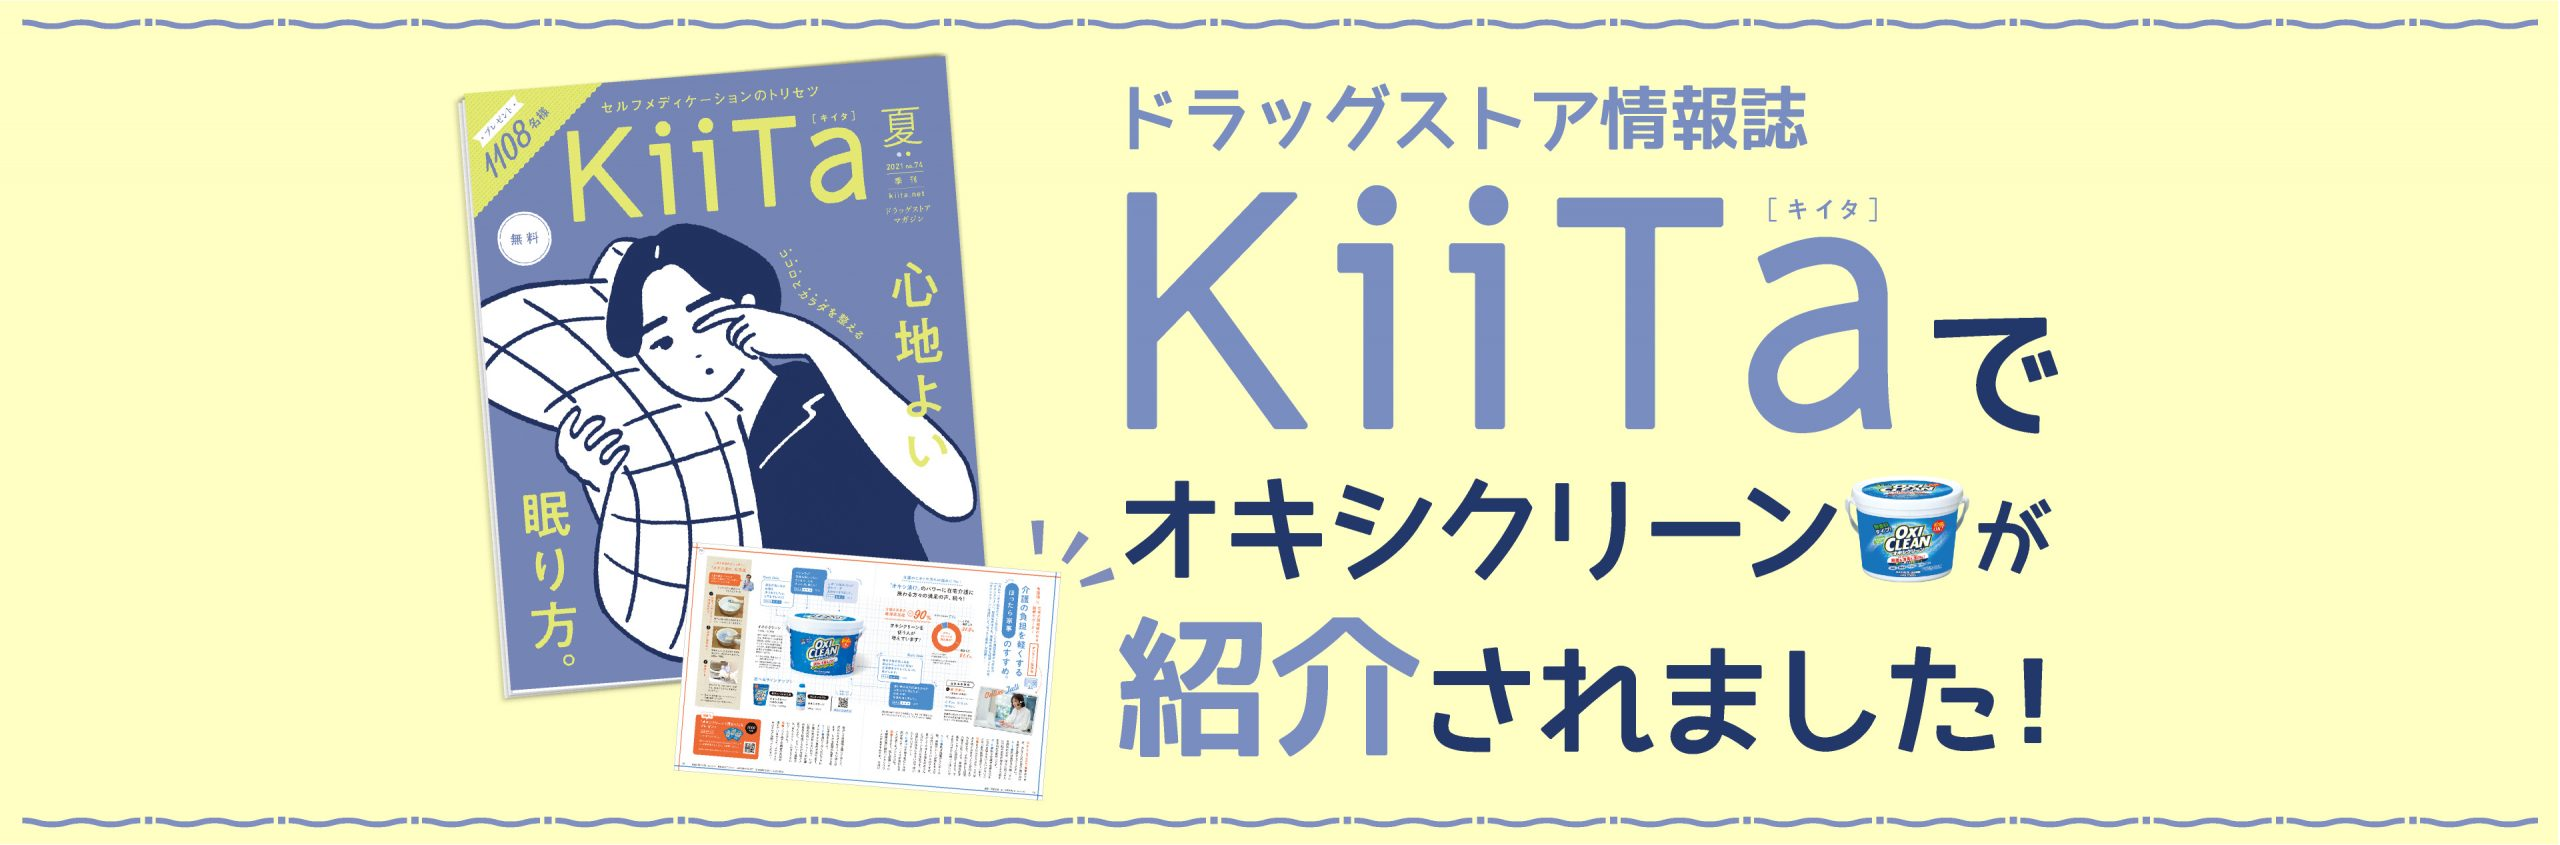 Kiita記事紹介バナー